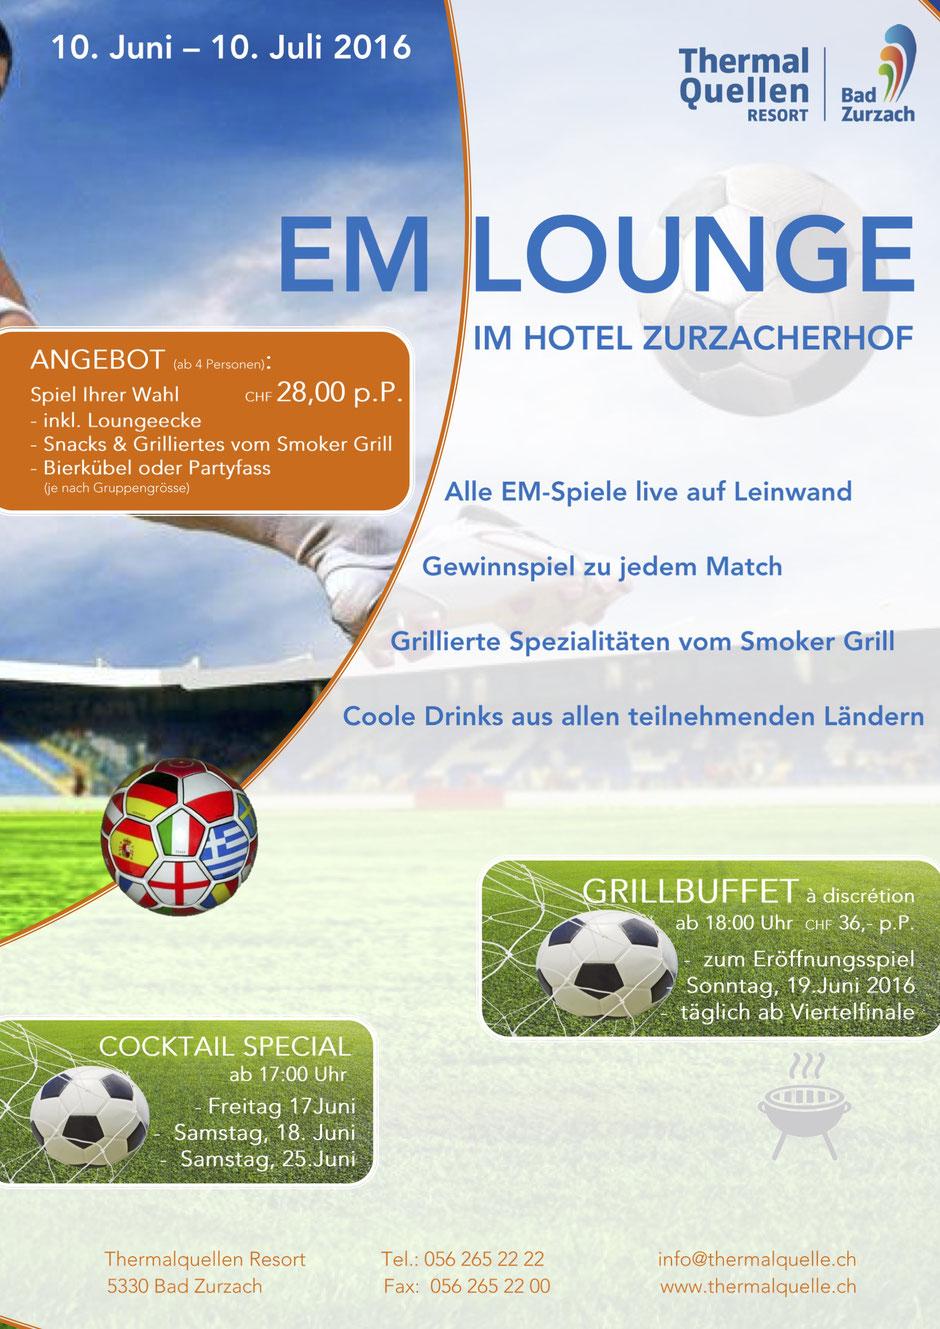 Plakat EM-Lounge, Zurzacherhof, Bad Zurzach